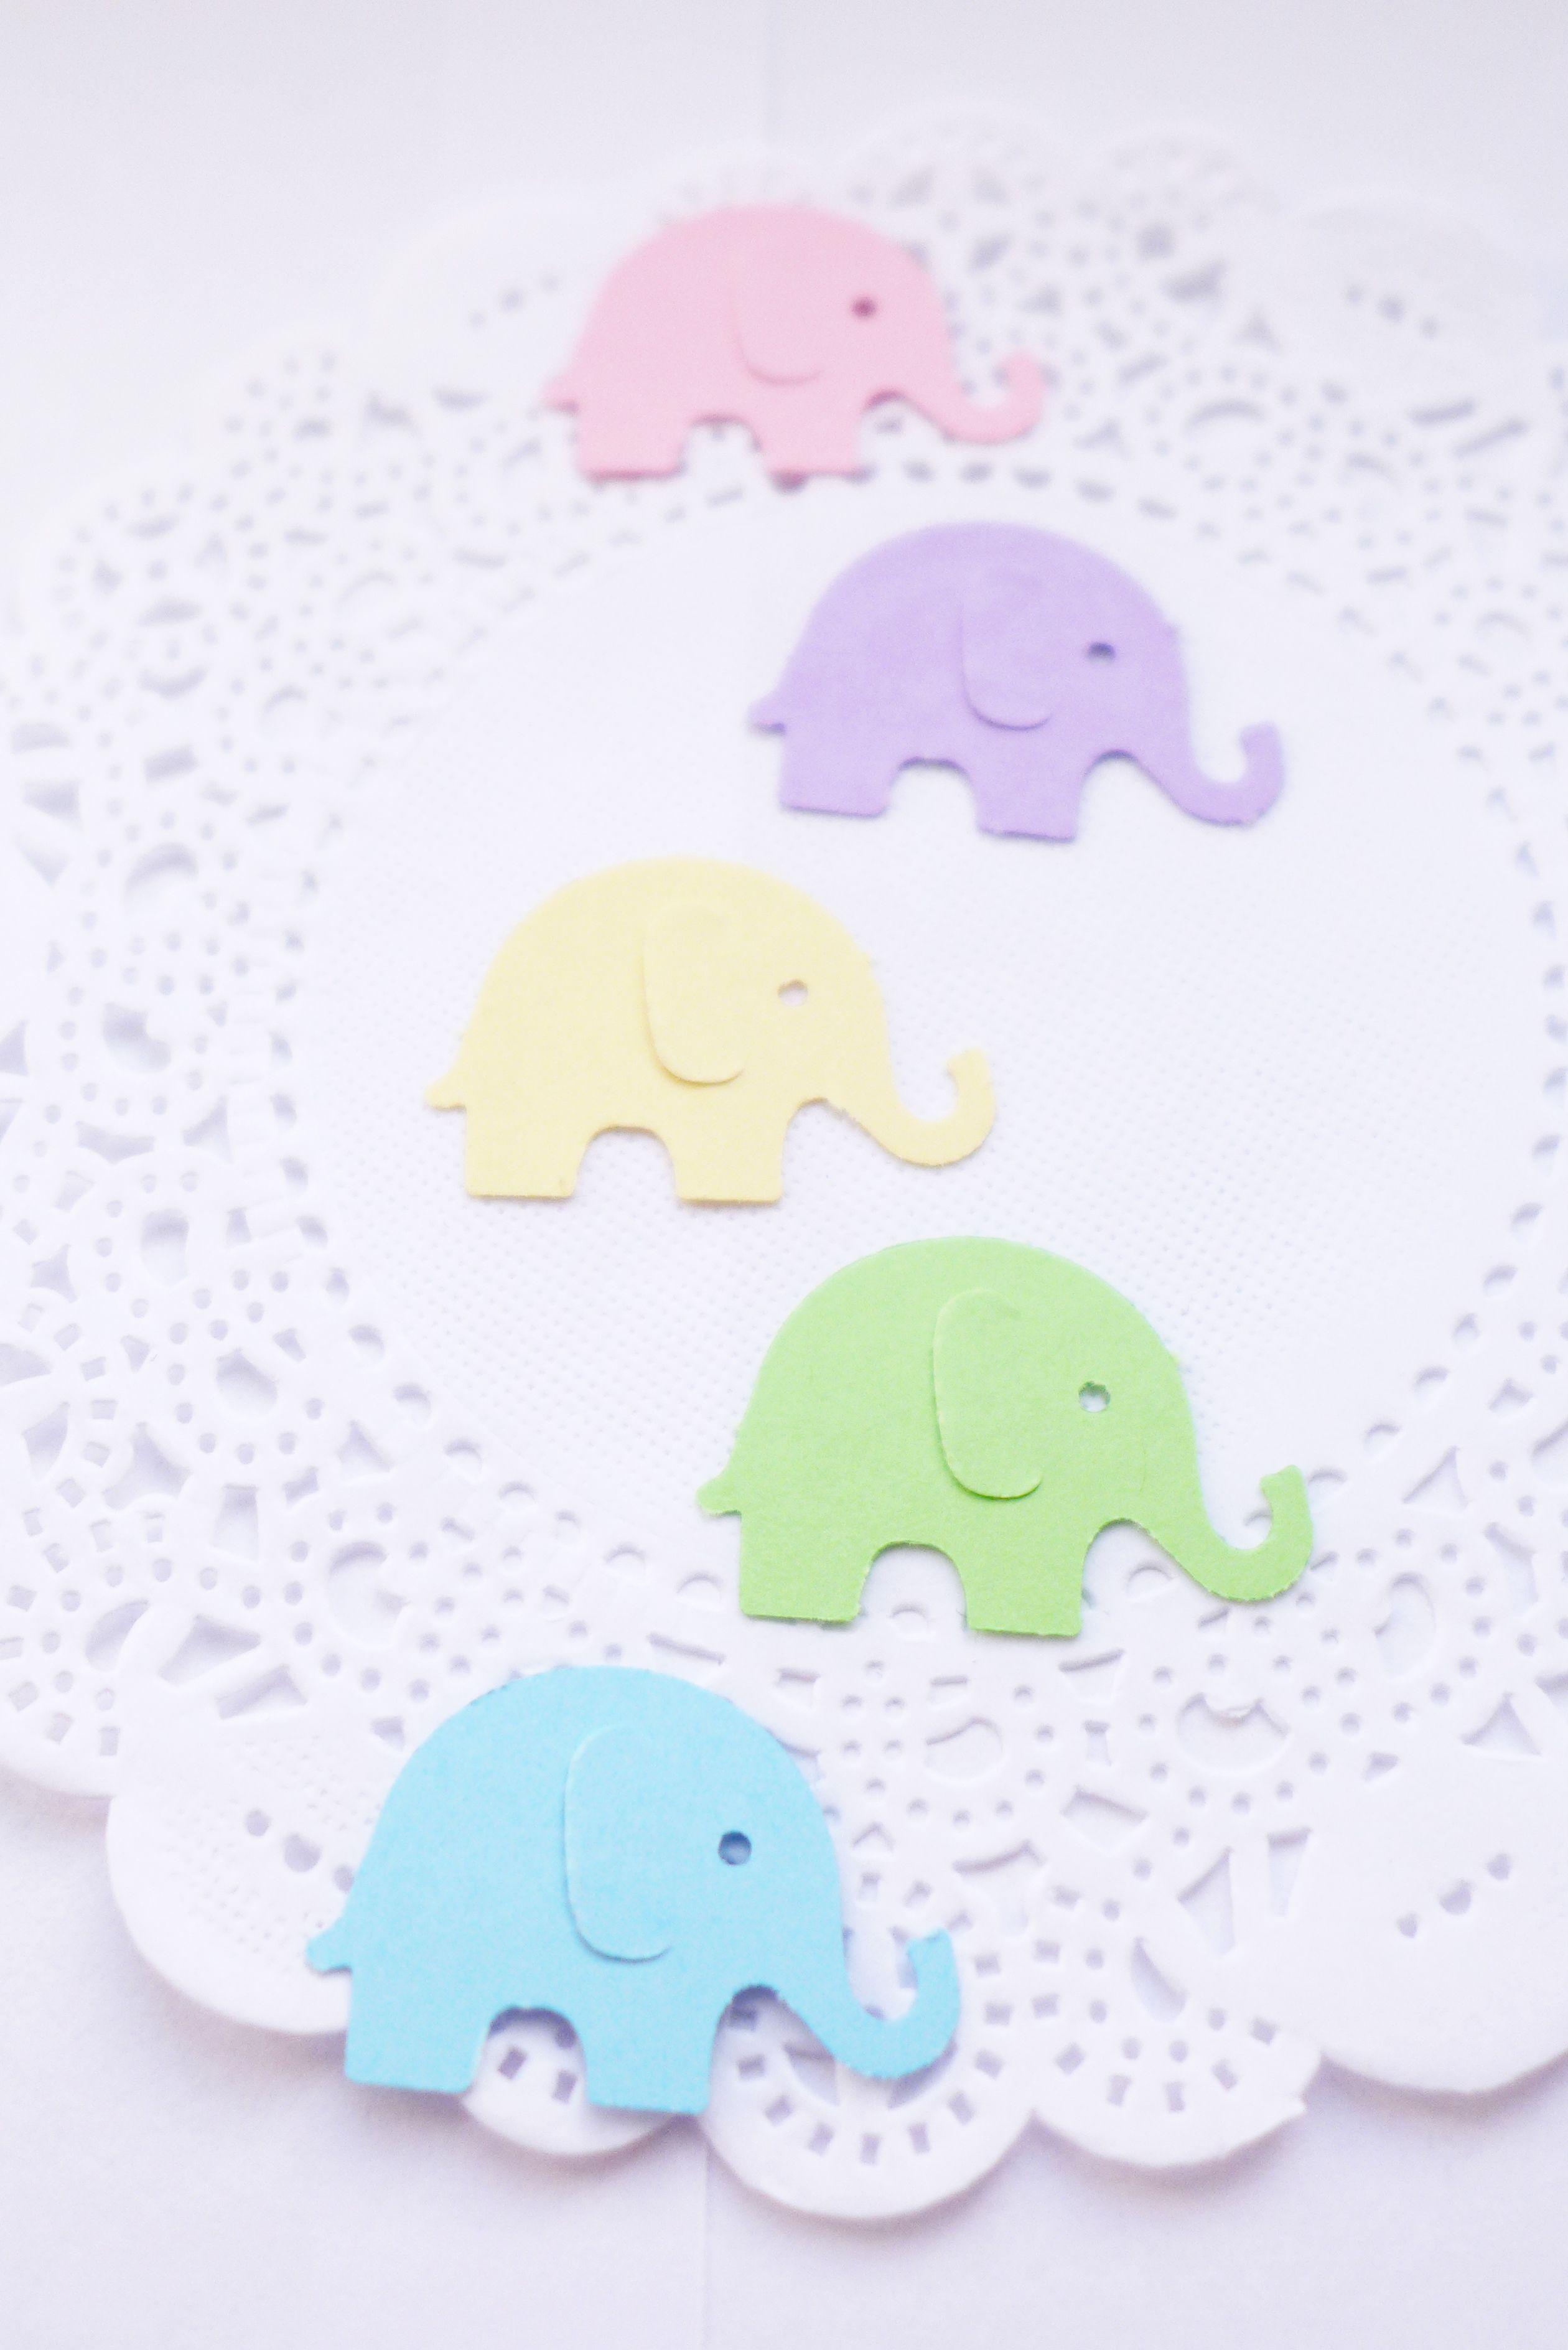 Elephant Pastel Colors Confetti By Athenascraftroom On Etsy #Elephant #